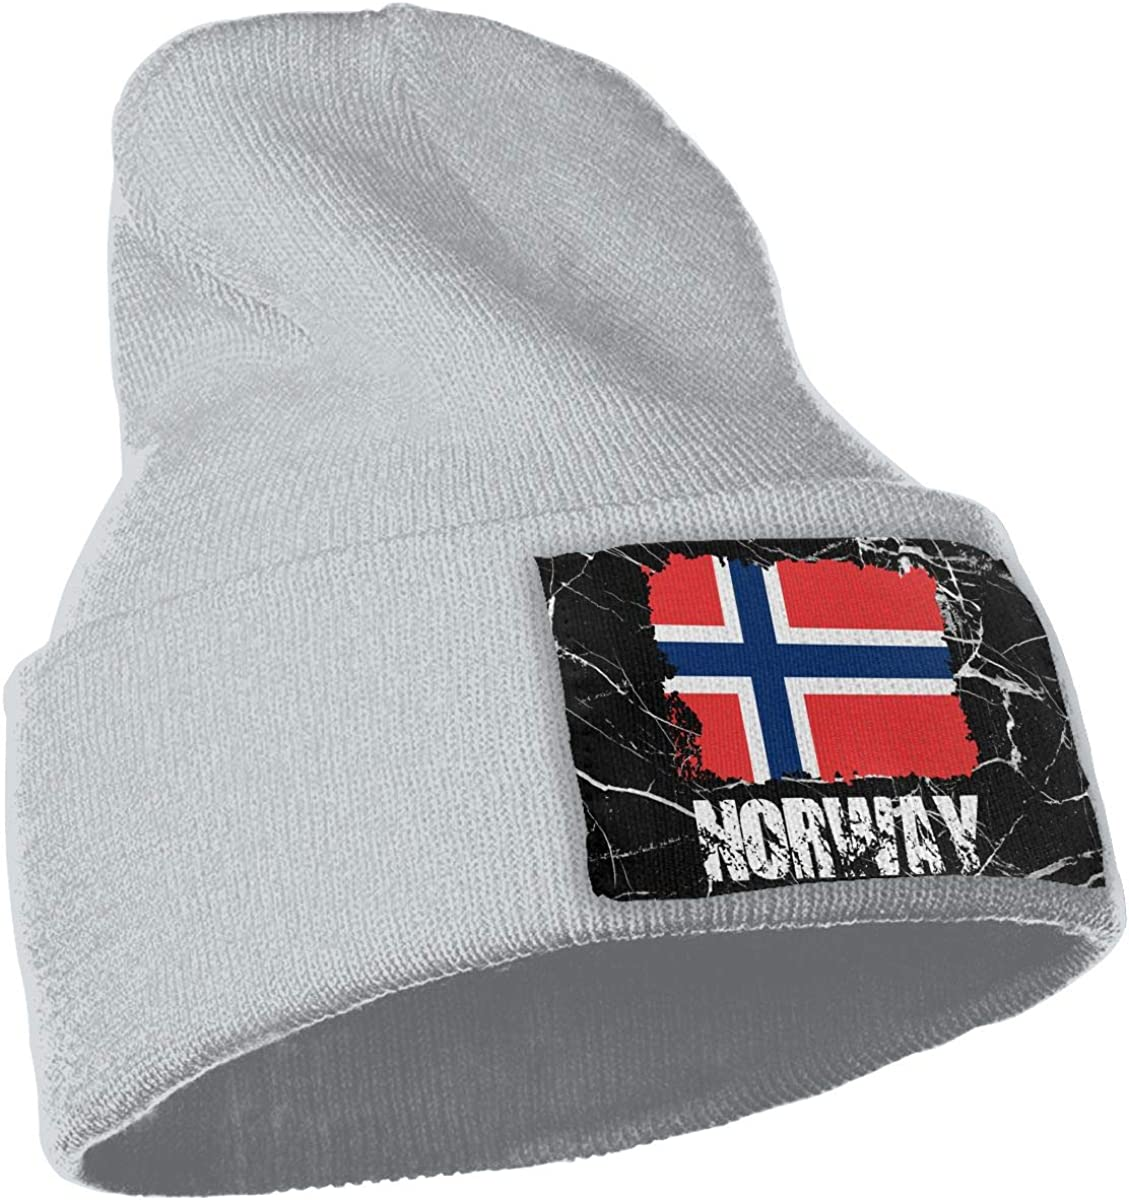 Norway Flag Beanie Cap Hat Men /& Women Knit Hats Stretchy /& Soft Beanie